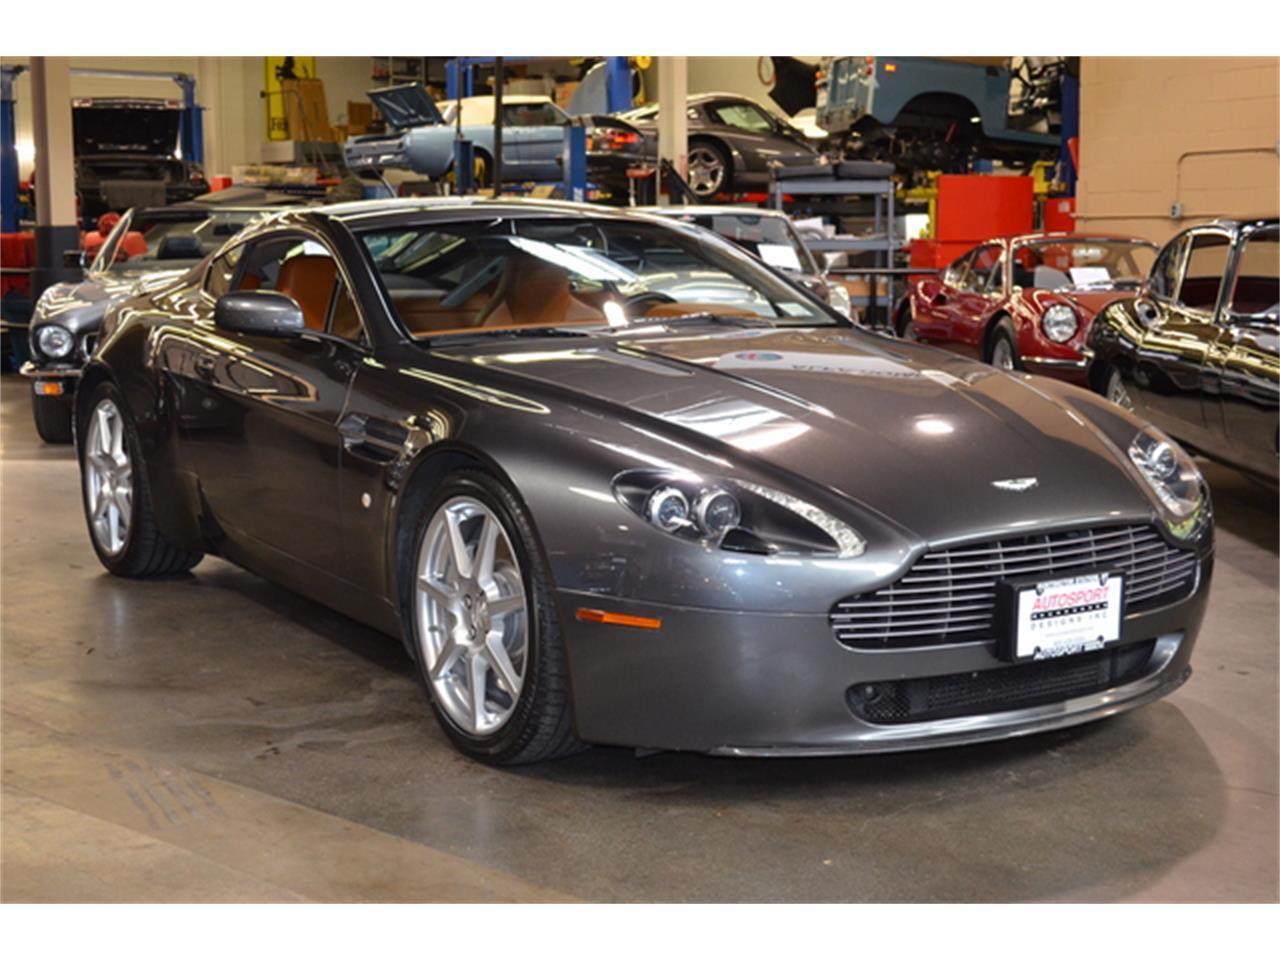 Aston Martin Vantage For Sale ClassicCarscom CC - 06 aston martin vantage